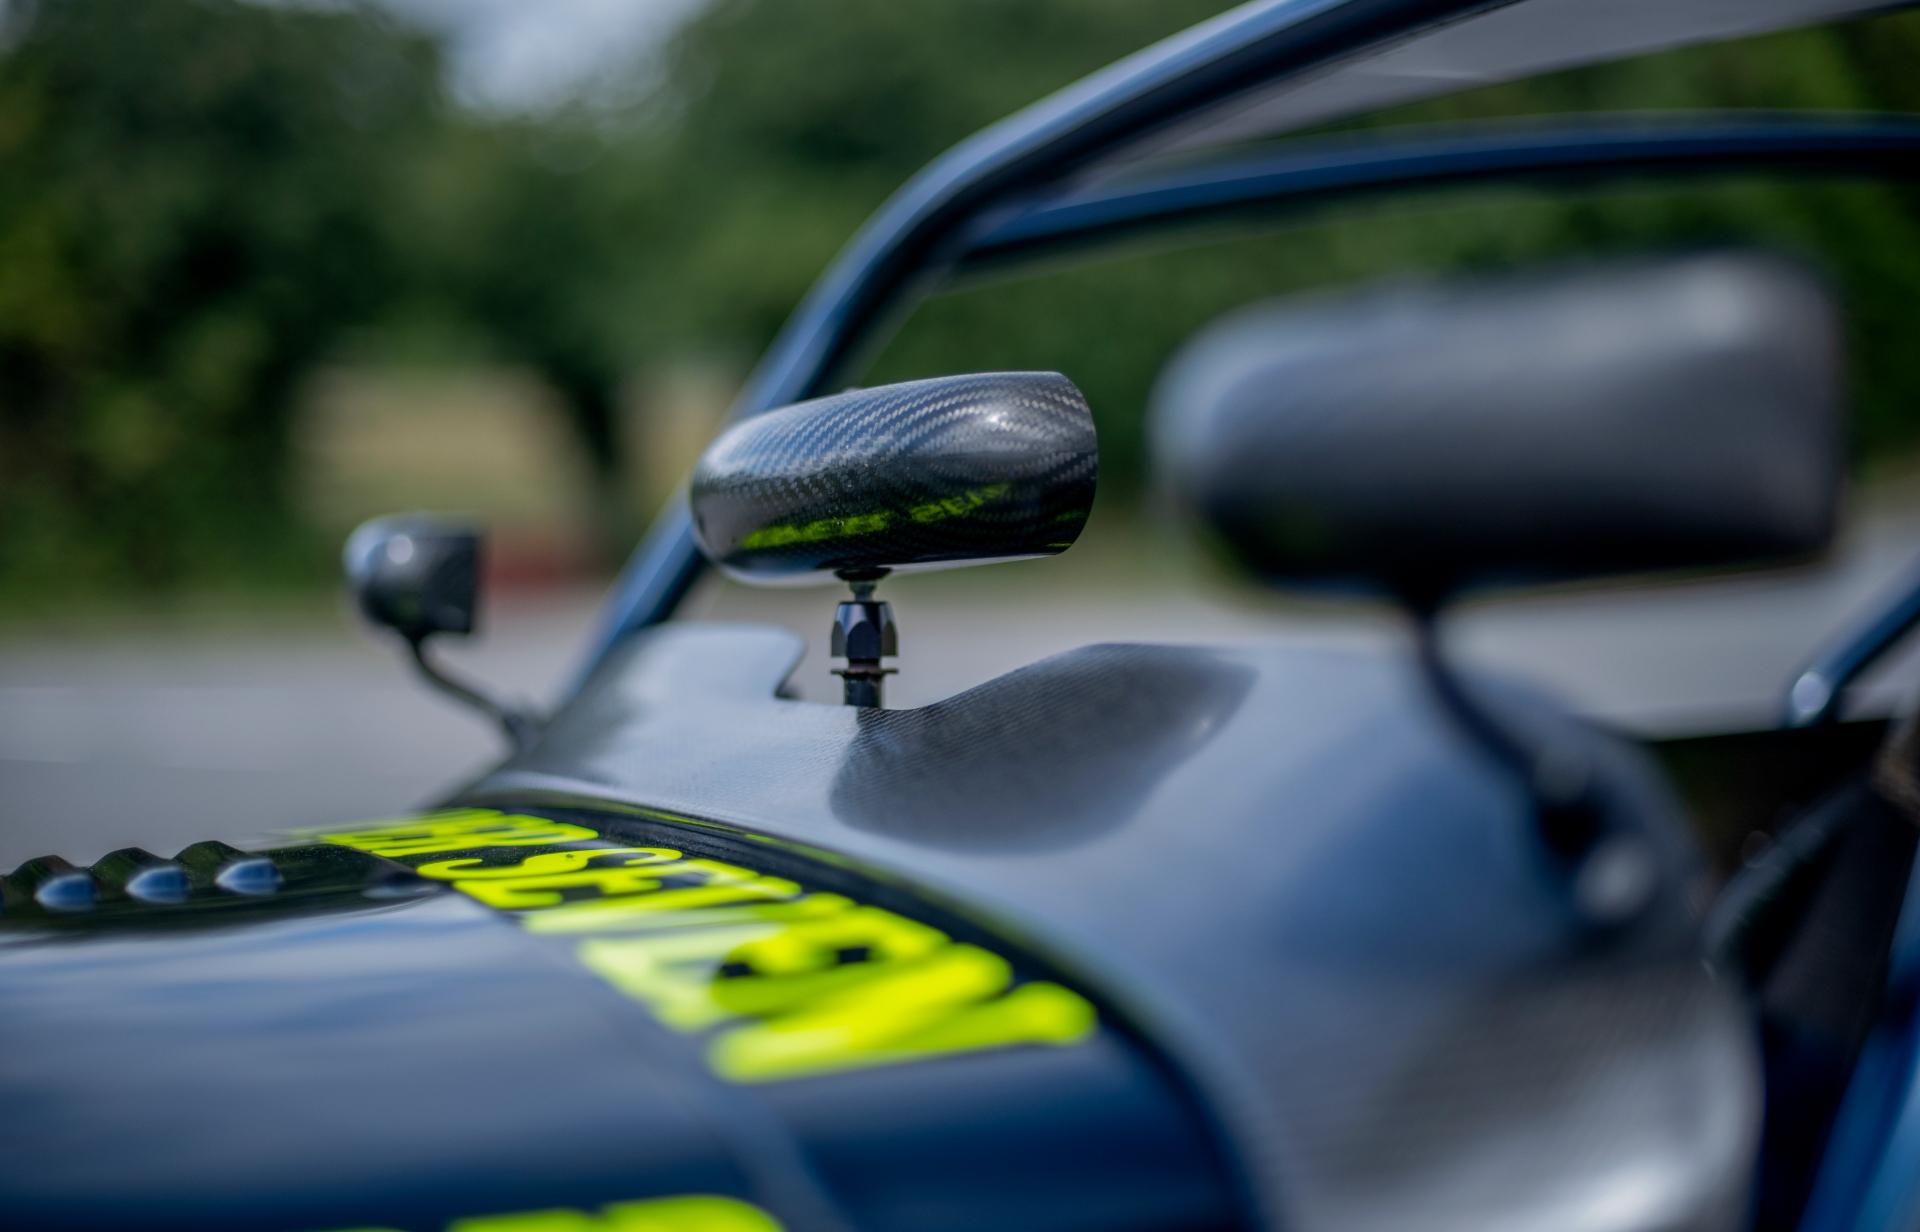 Caterham 7 JPE carbon fiber rear view mirror